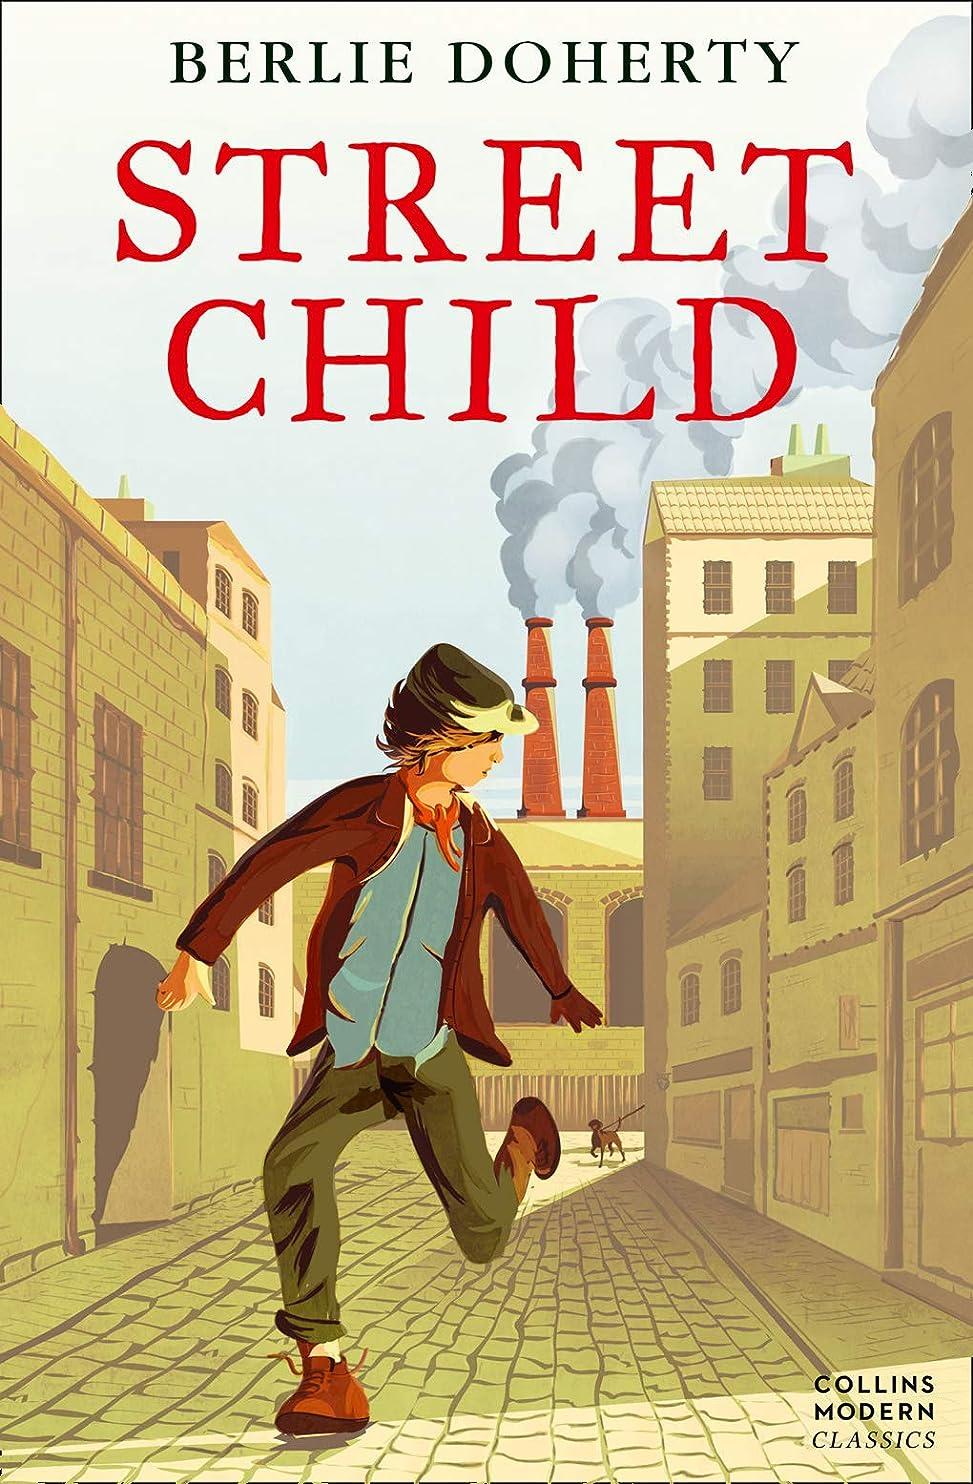 領収書分離噴火Street Child (Collins Modern Classics) (English Edition)